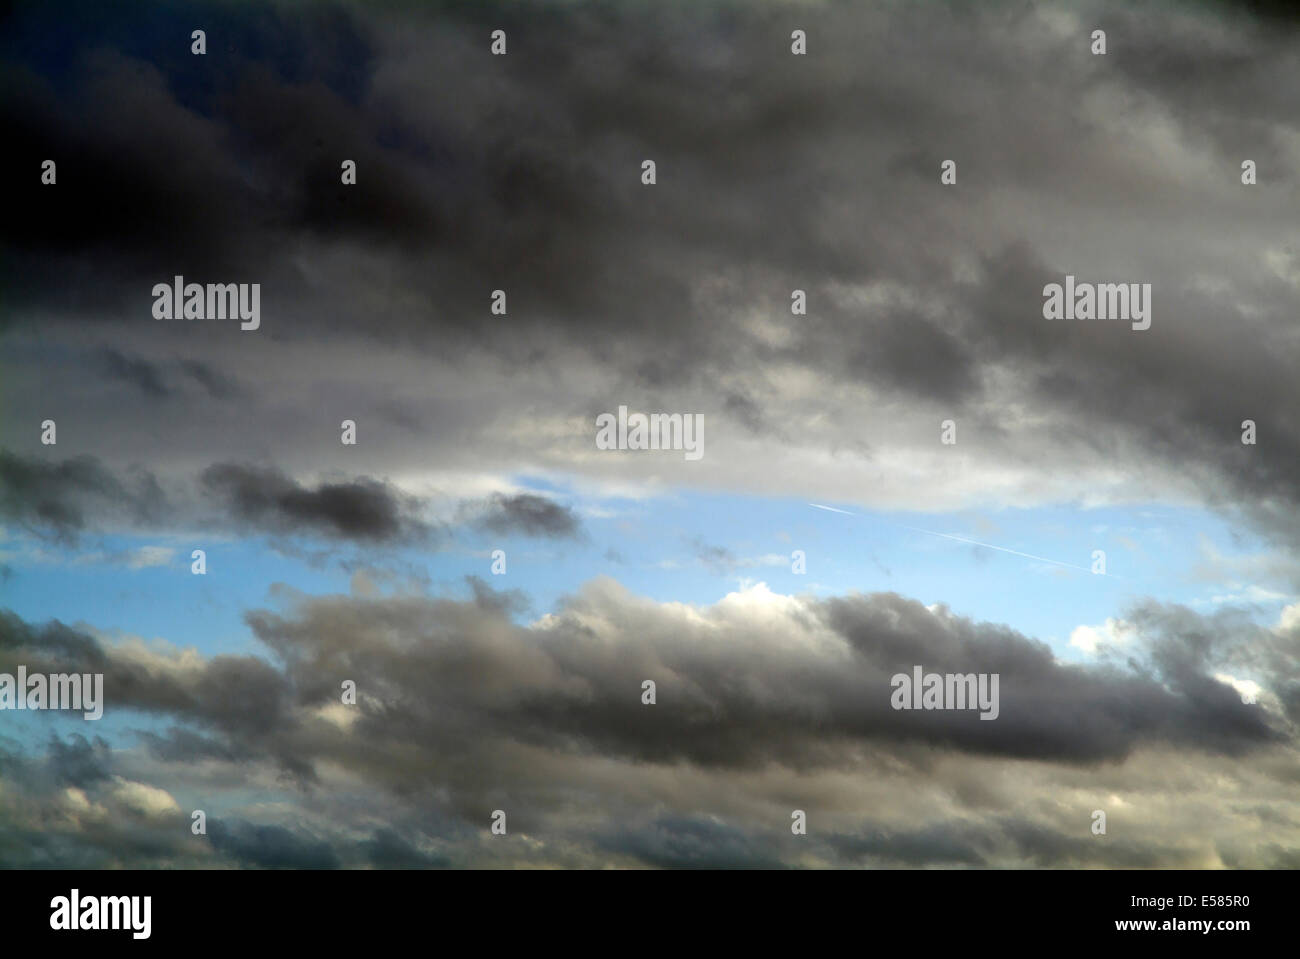 Grey rain clouds against blue sky - Europe Germany Berlin Stock Photo